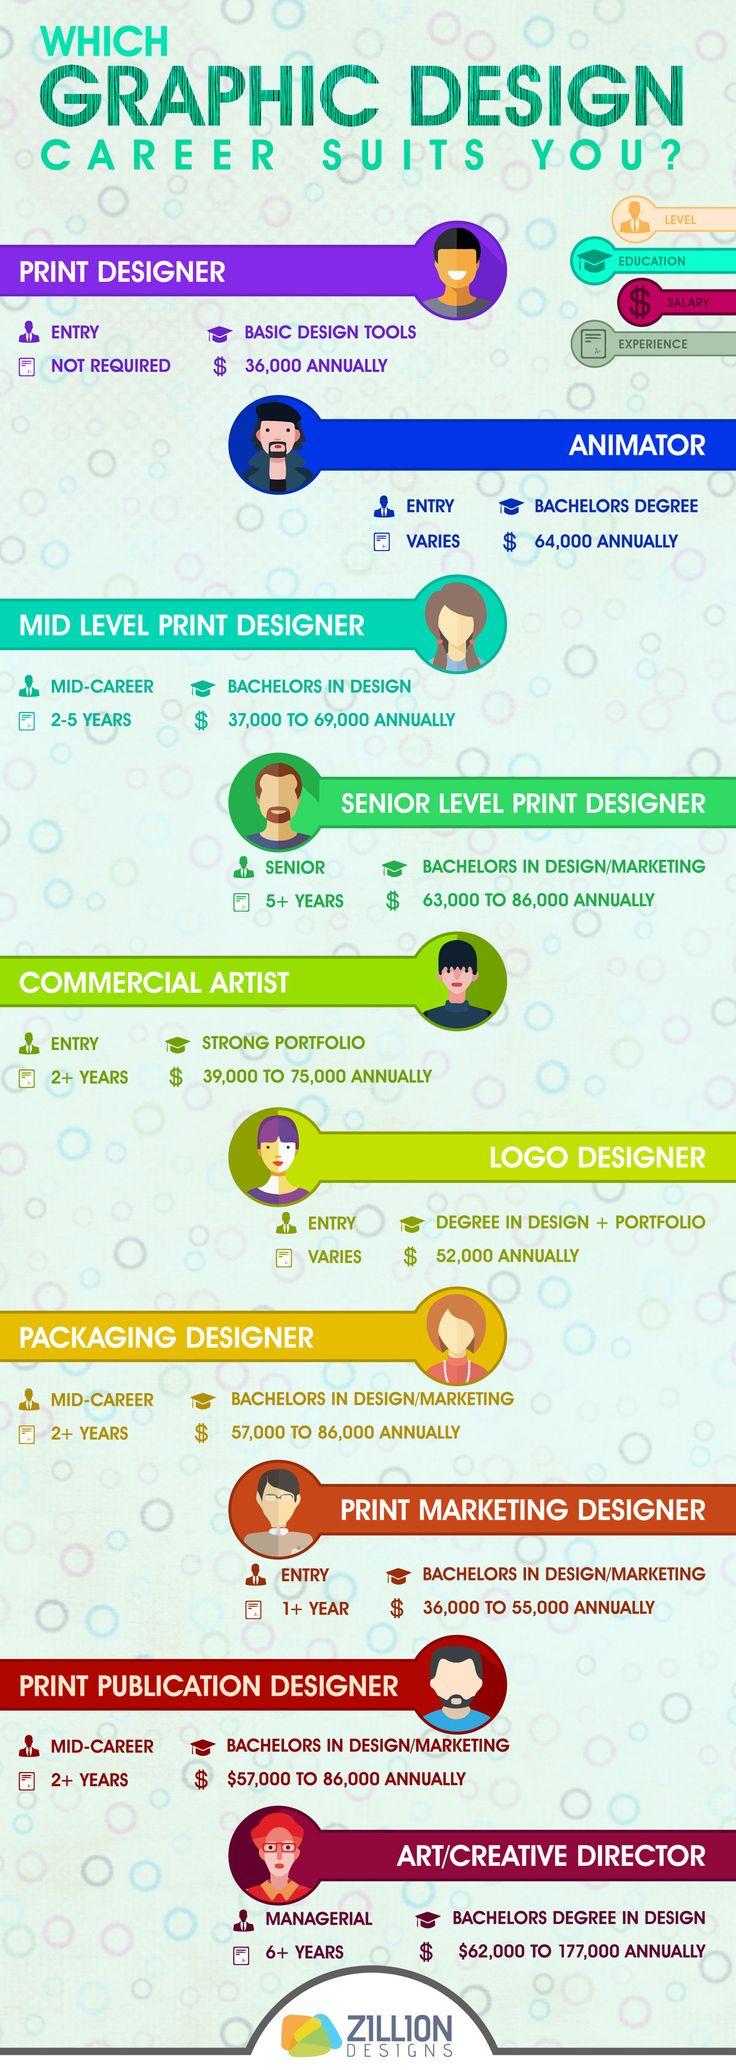 best ideas about graphic designer office graphic 17 best ideas about graphic designer office graphic design programs adobe and graphic design